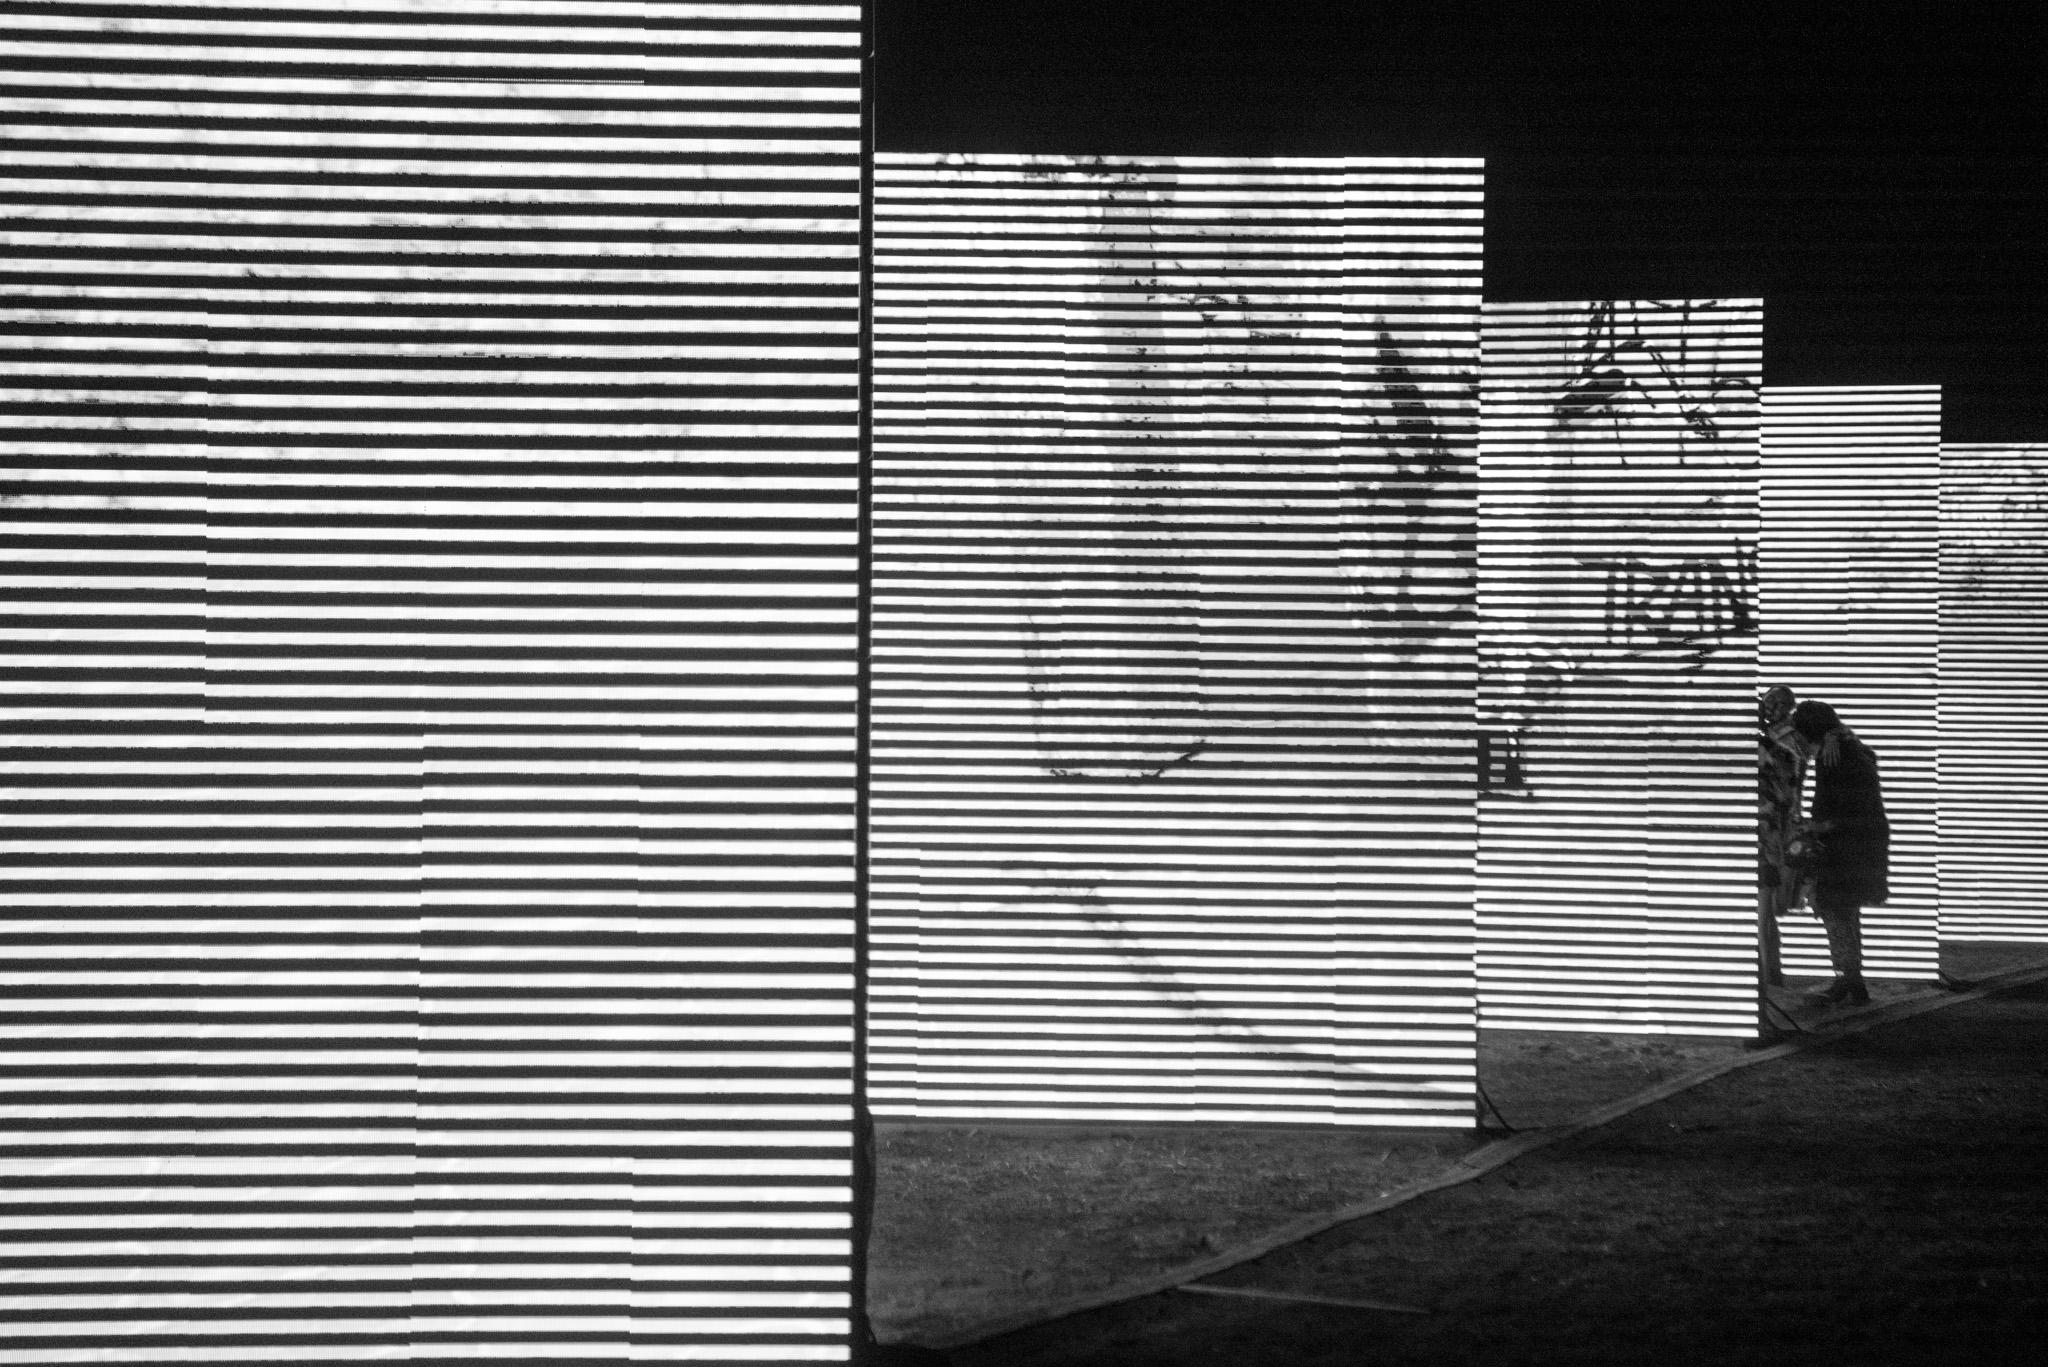 CALTRISTAN_CAL-TRISTAN_PITCH_FESTIVAL_PHOTOGRAPHY_PHOTOGRAPHER-51.jpg